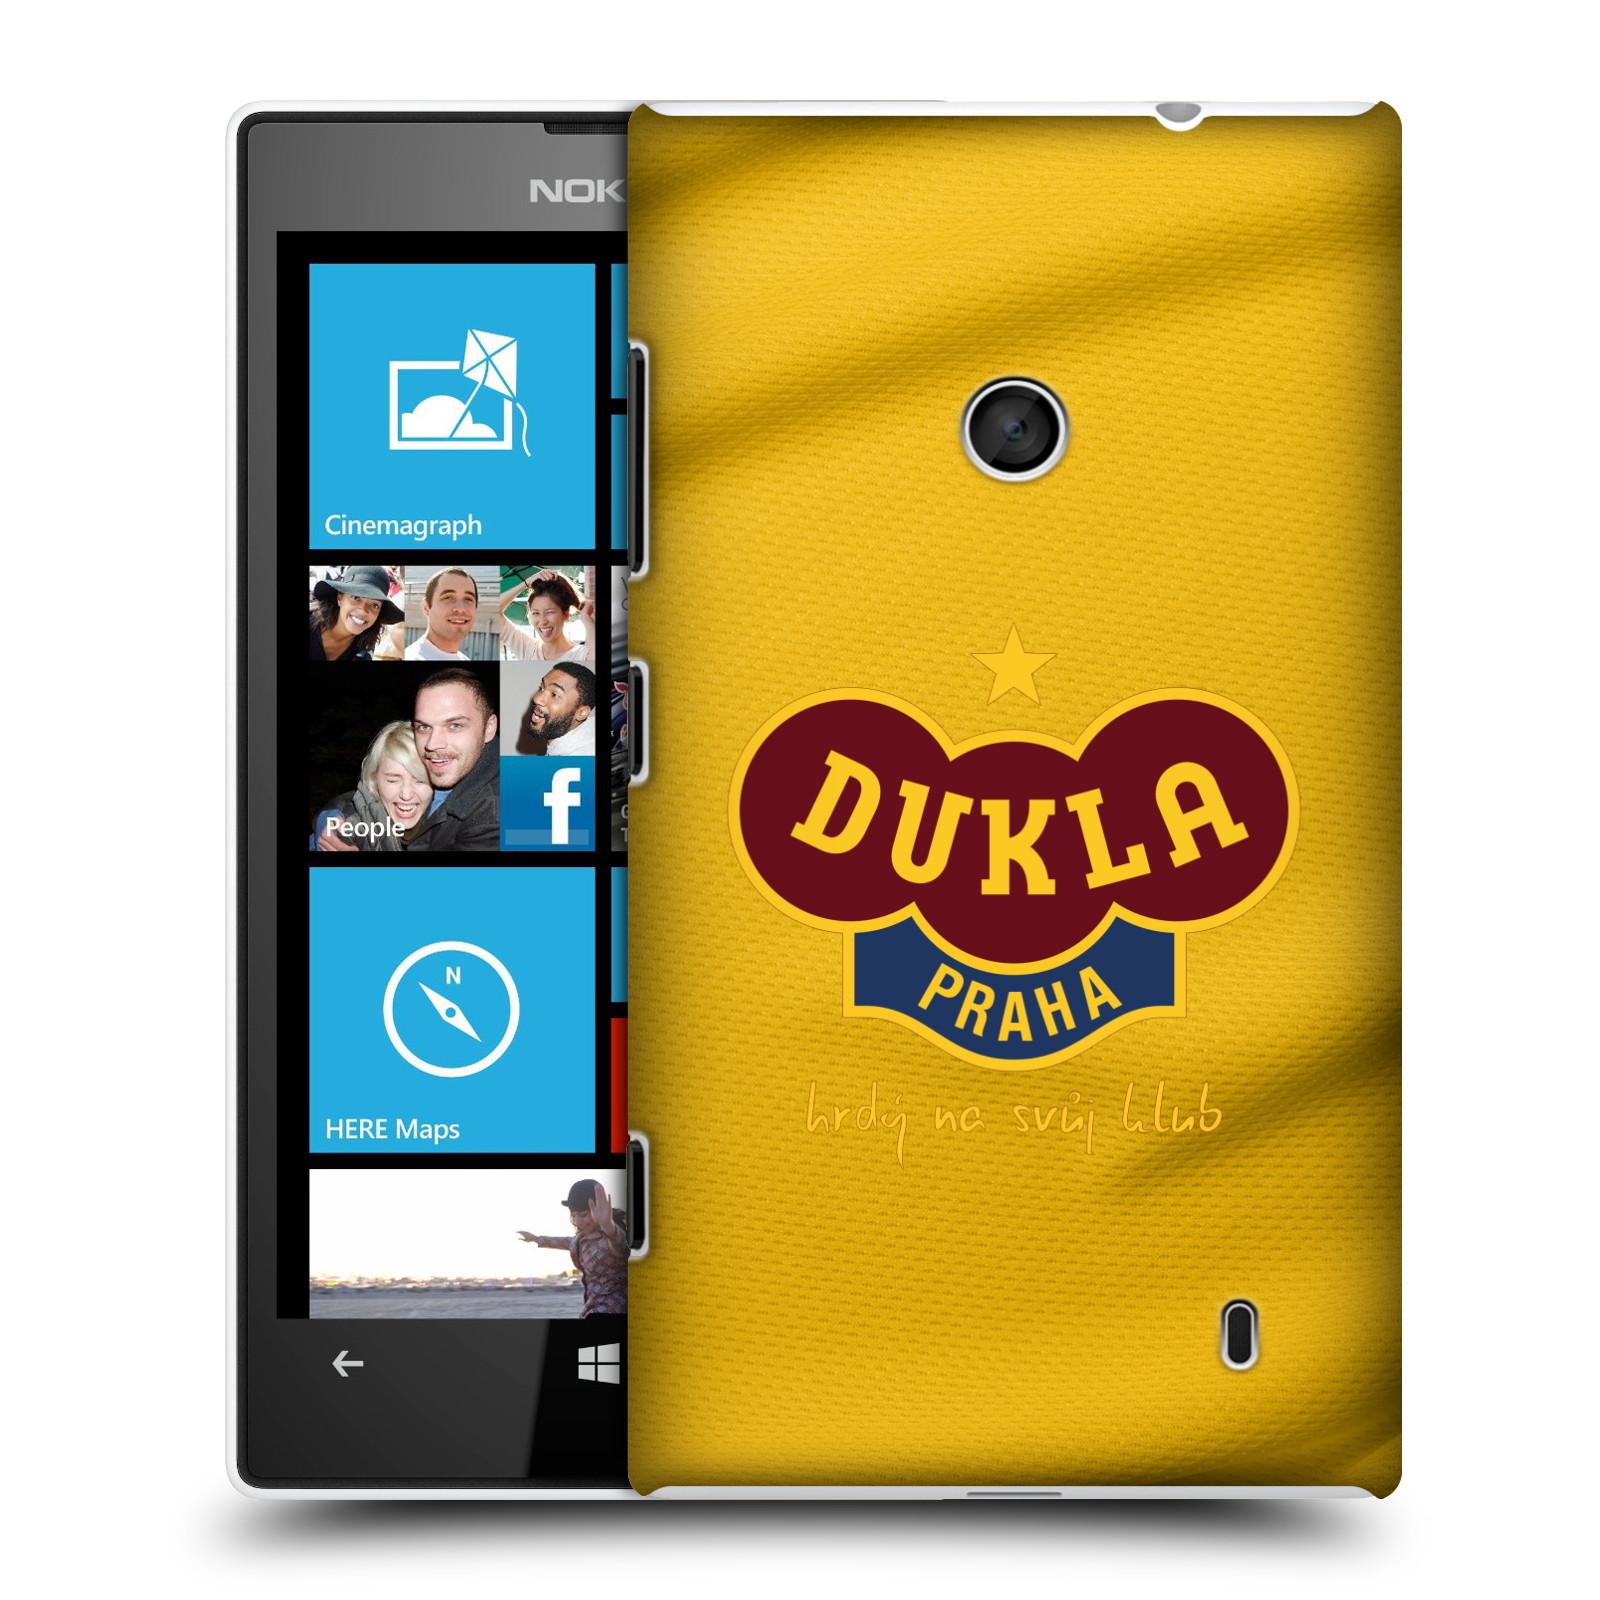 Plastové pouzdro na mobil Nokia Lumia 520 - FK Dukla Praha - Žlutý dres